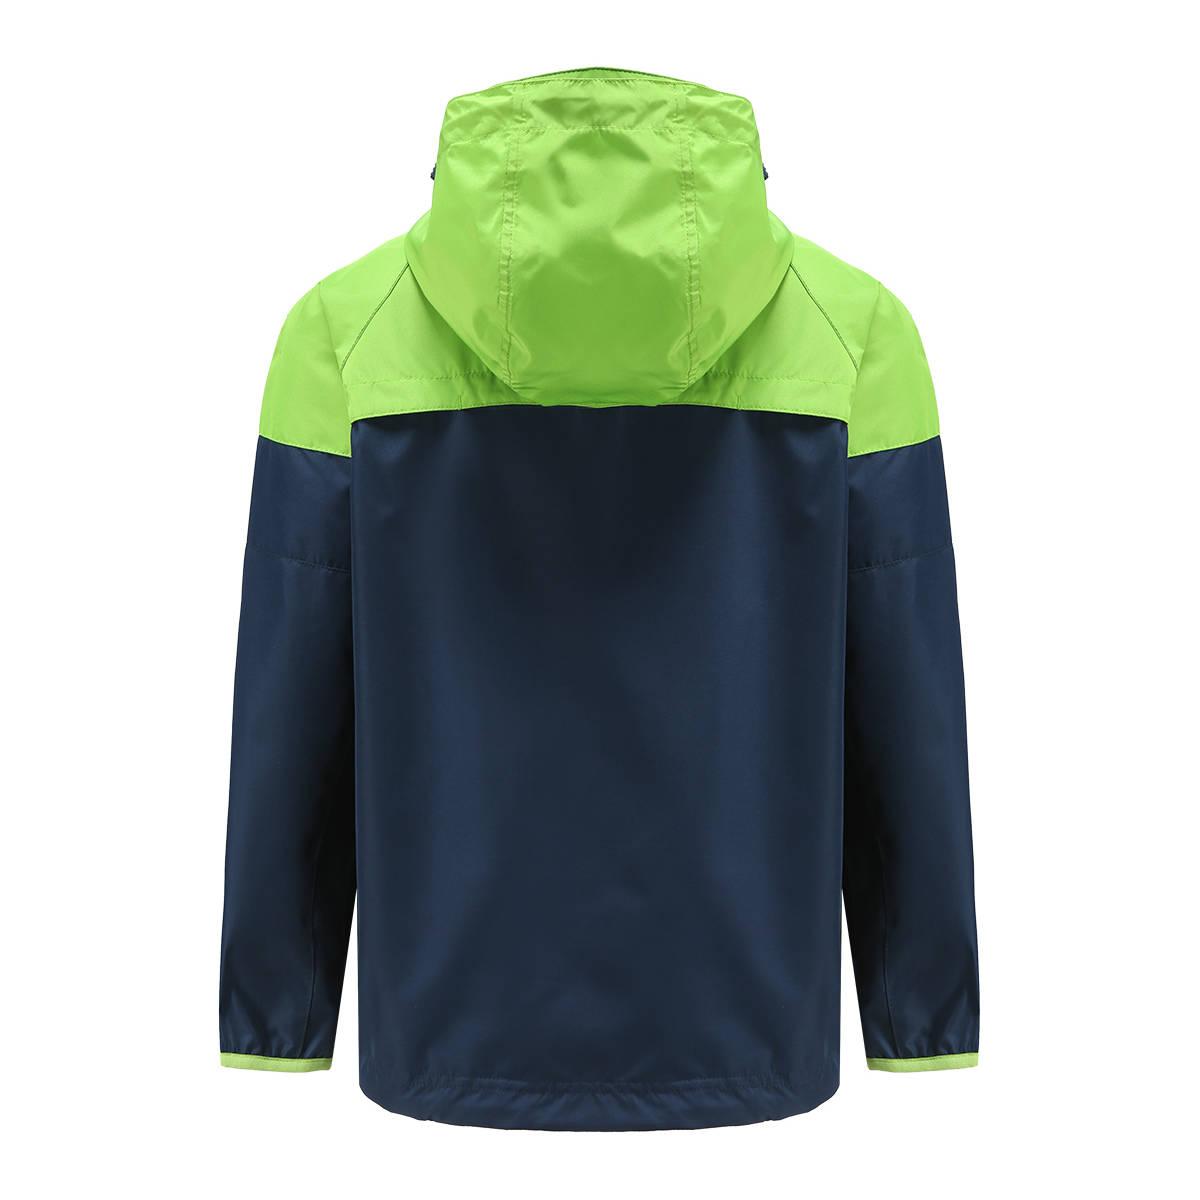 2021 Kids Wet Weather Jacket1